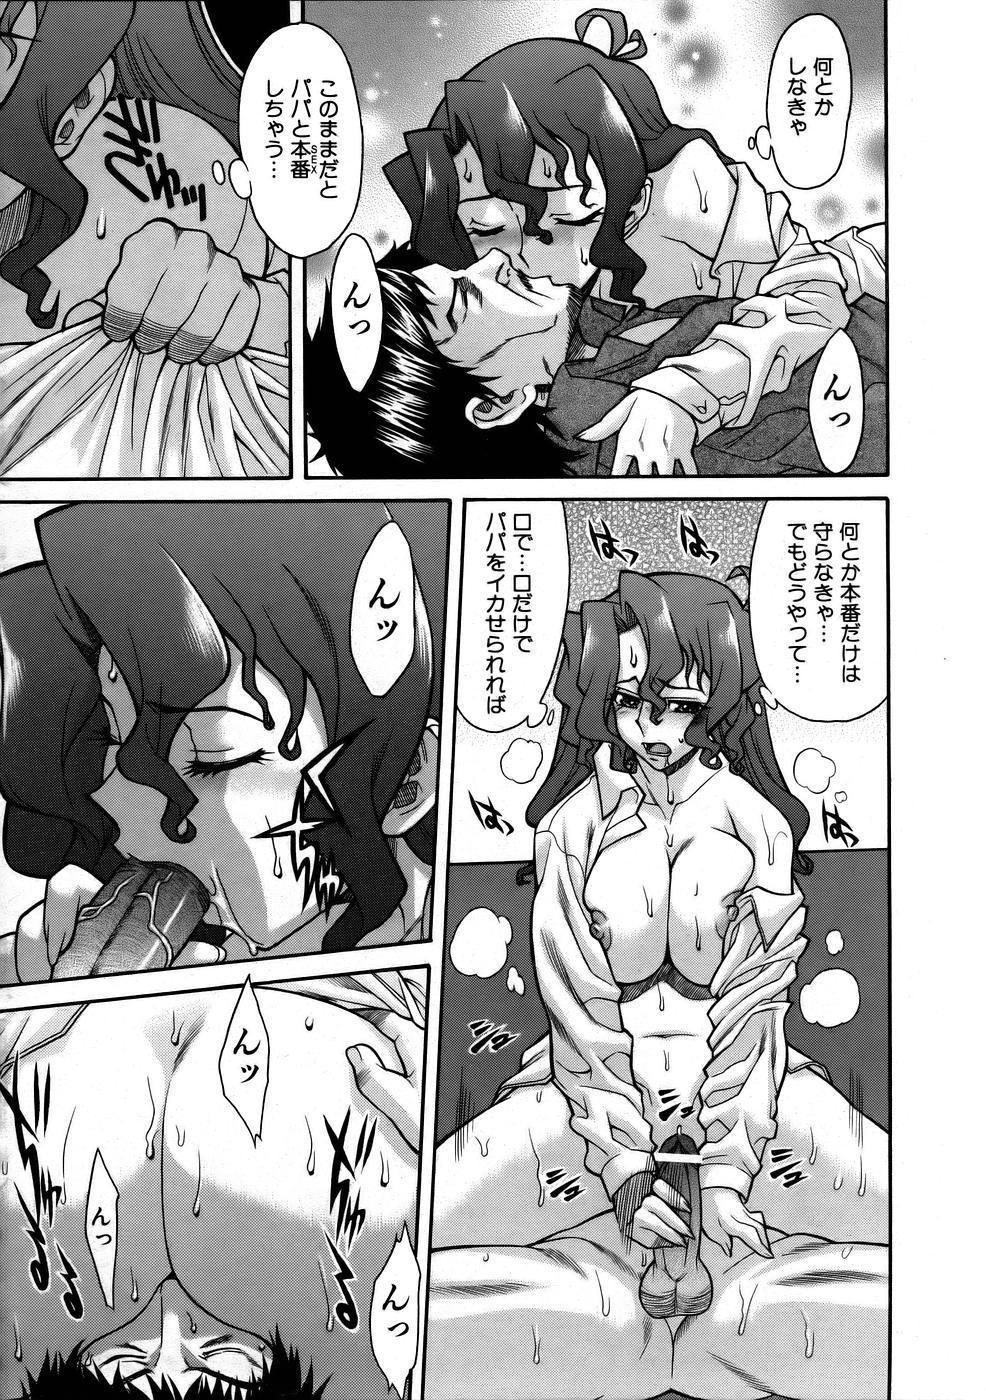 COMIC AUN 2005-10 Vol. 113 148